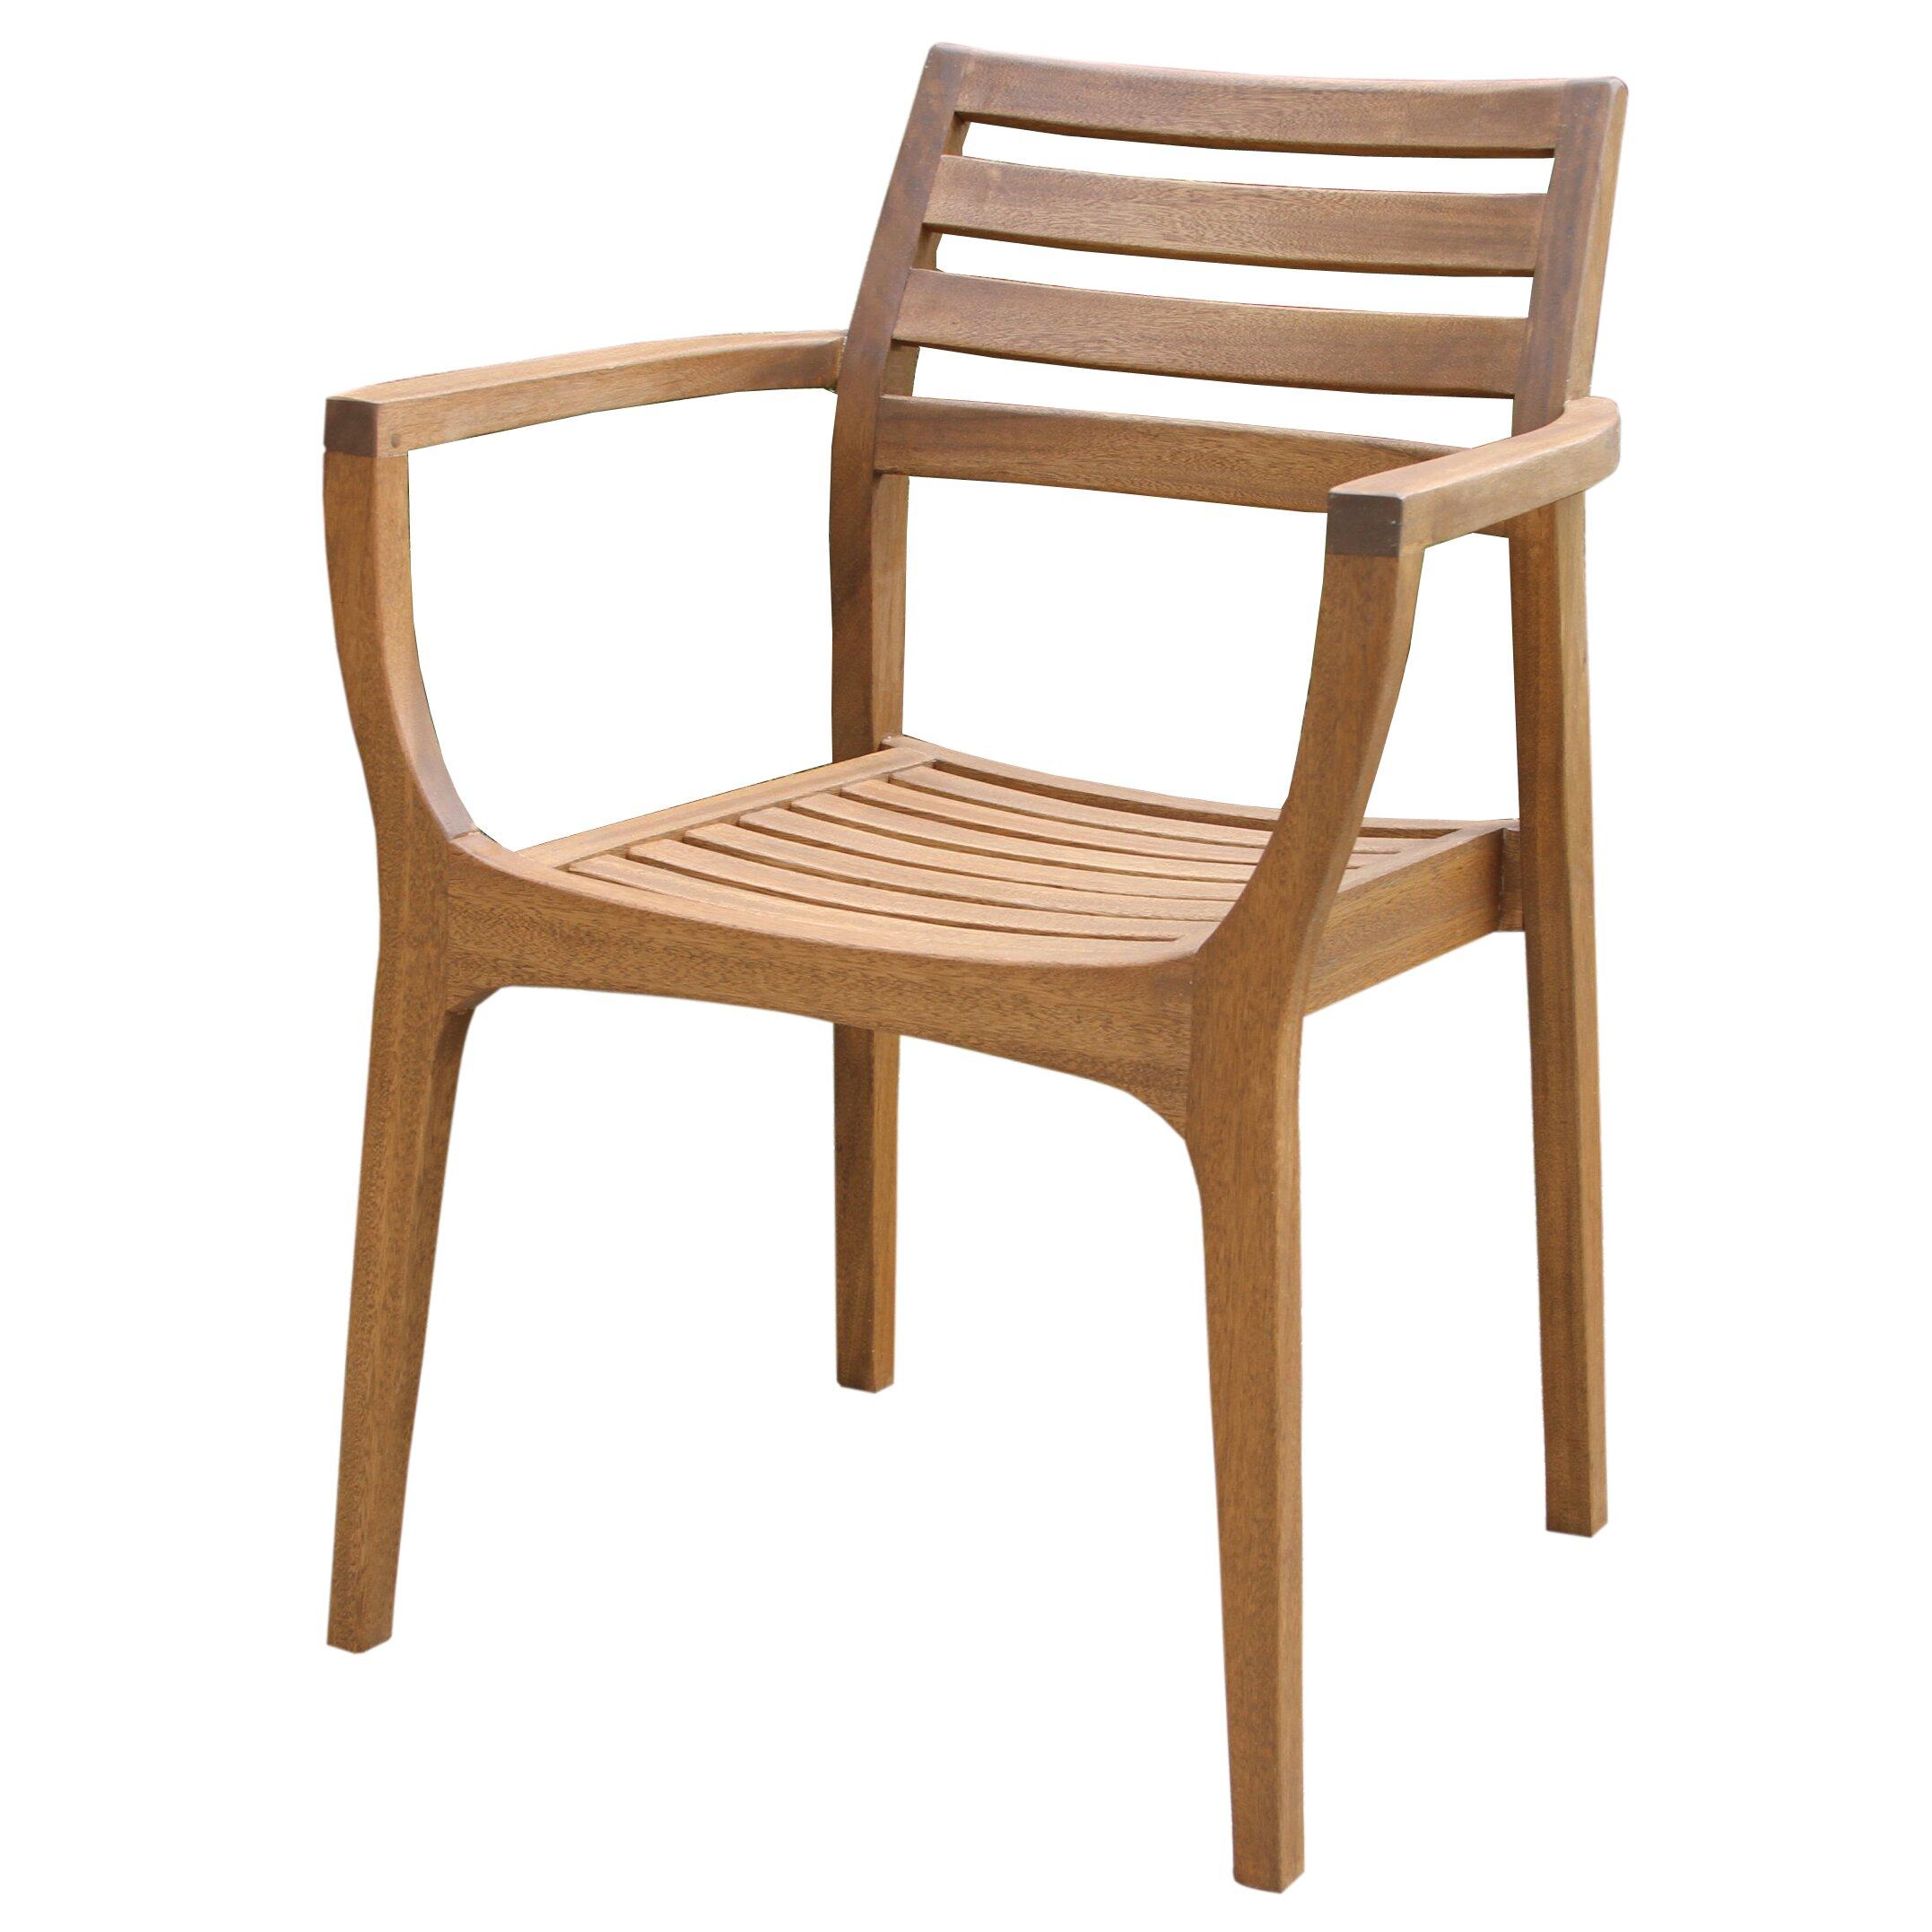 Outdoor Interiors Danish Eucalyptus Stacking Chair